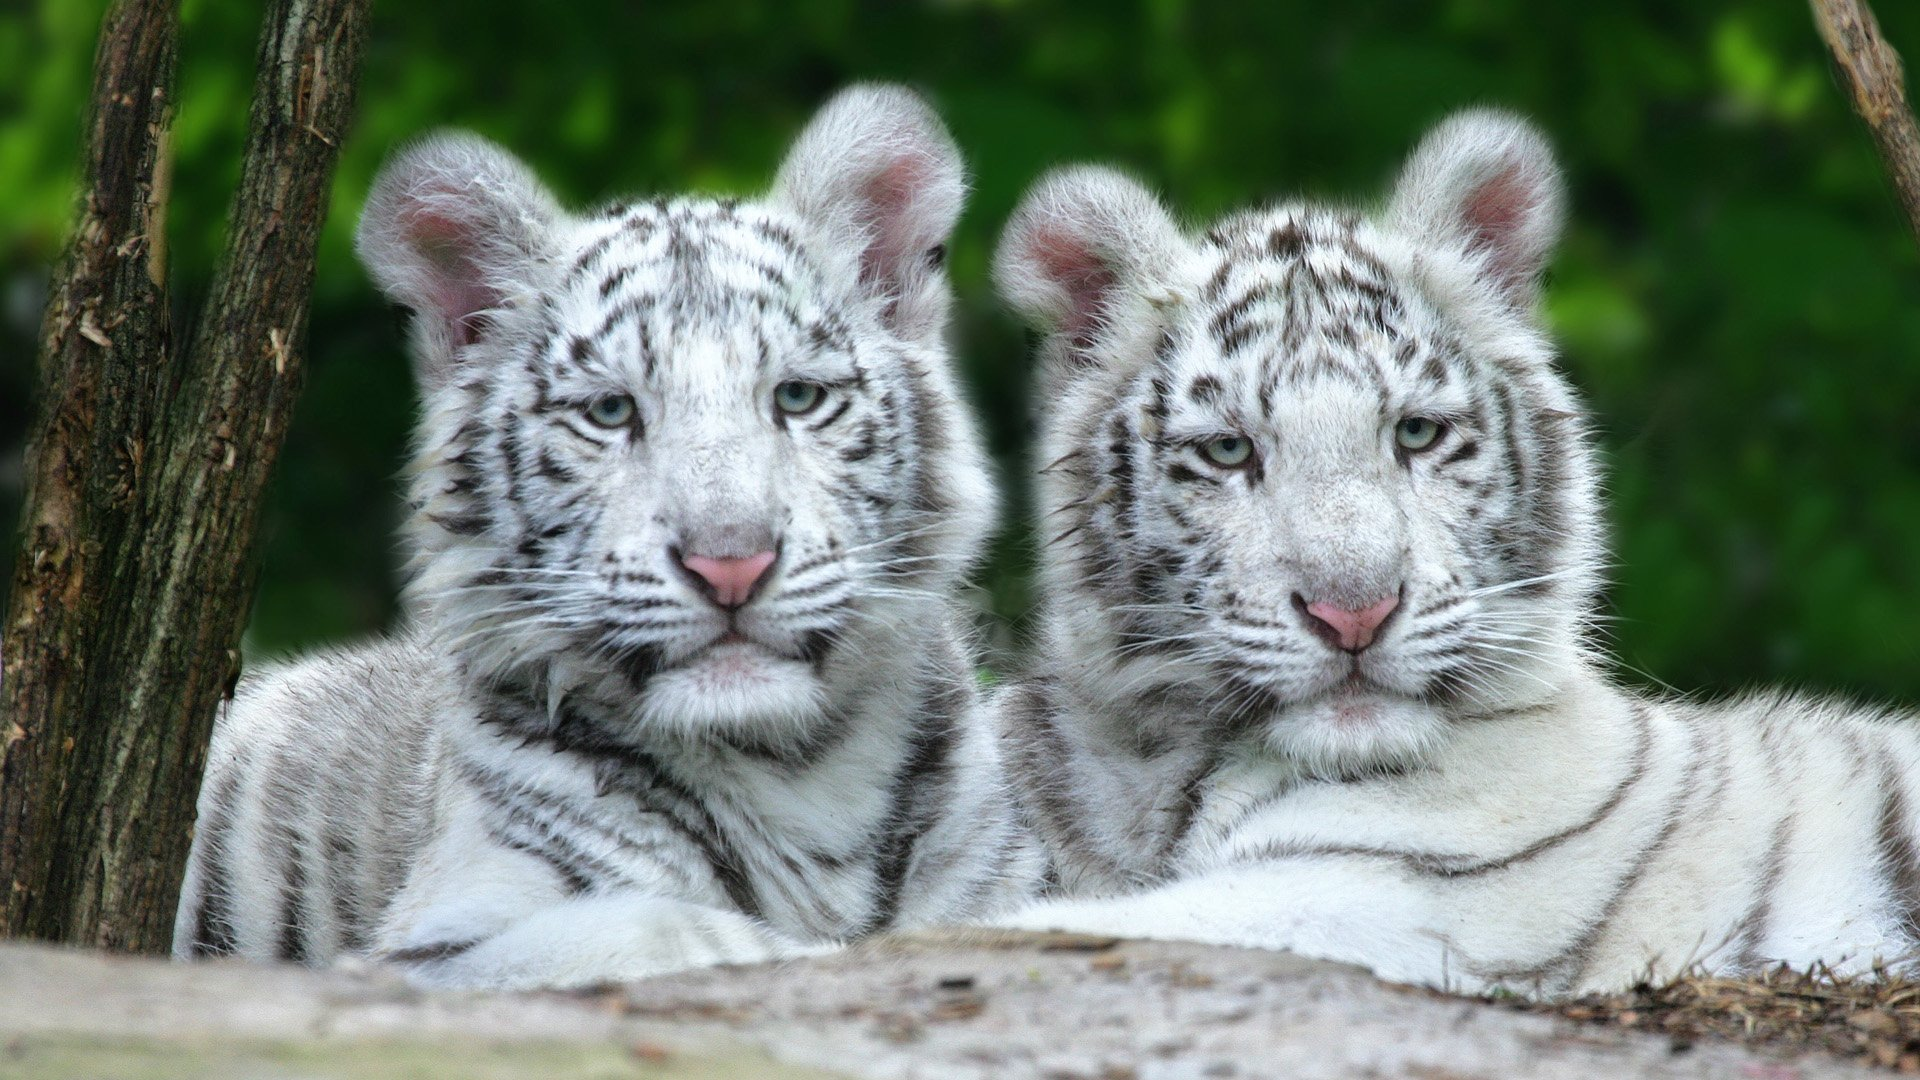 природа животные кот белый nature animals cat white  № 102792 бесплатно